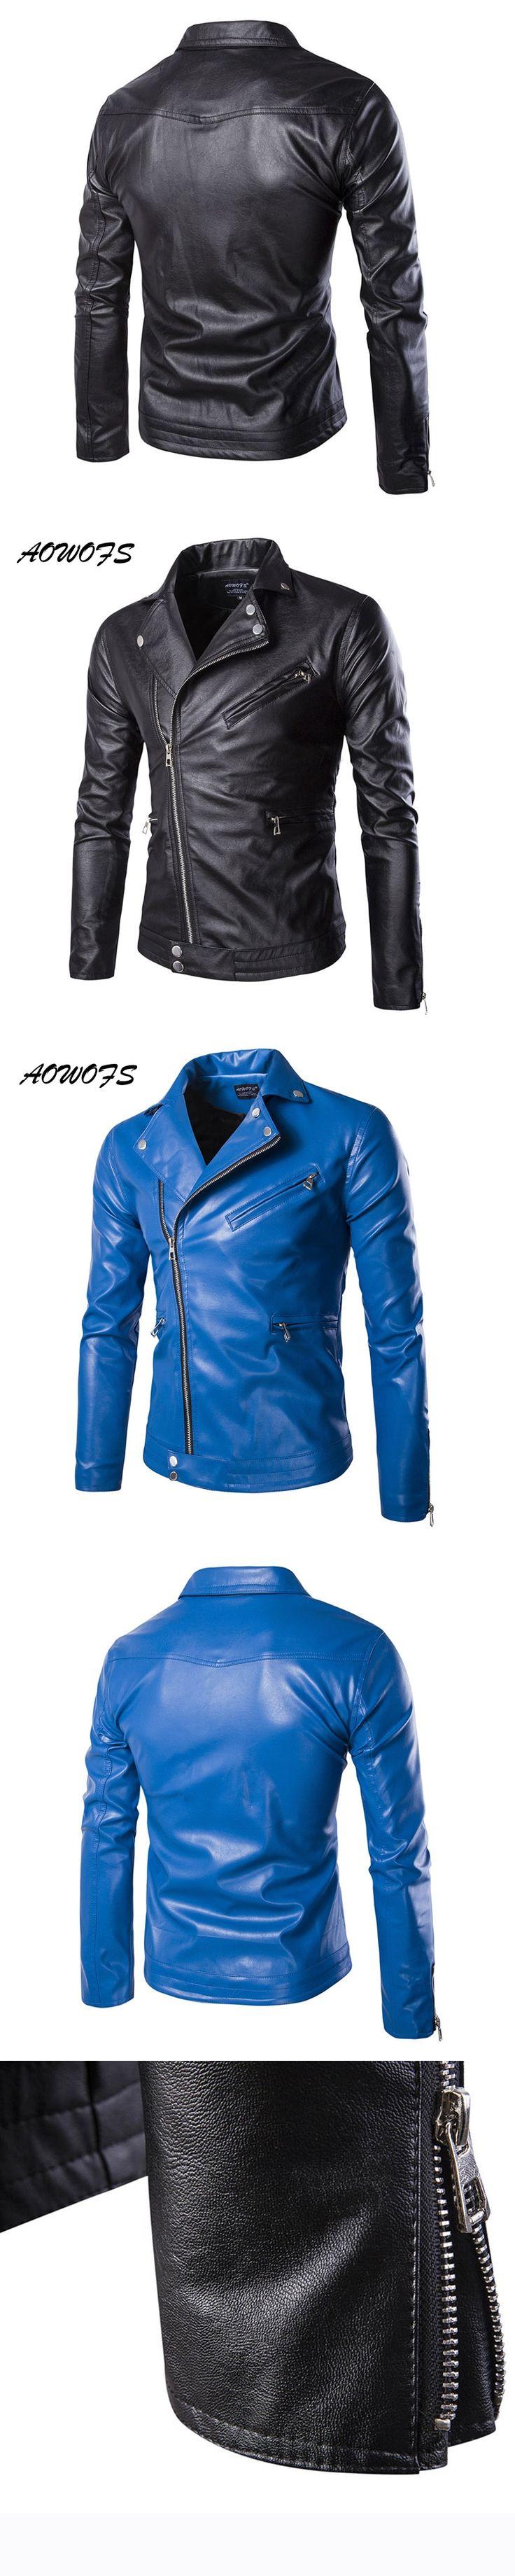 AOWOFS Mens Blue Leather Jackets Slim Fit Leather Blouson Jacket Coats Designer Punk Leather Biker Jackets for Men Spring 5XL